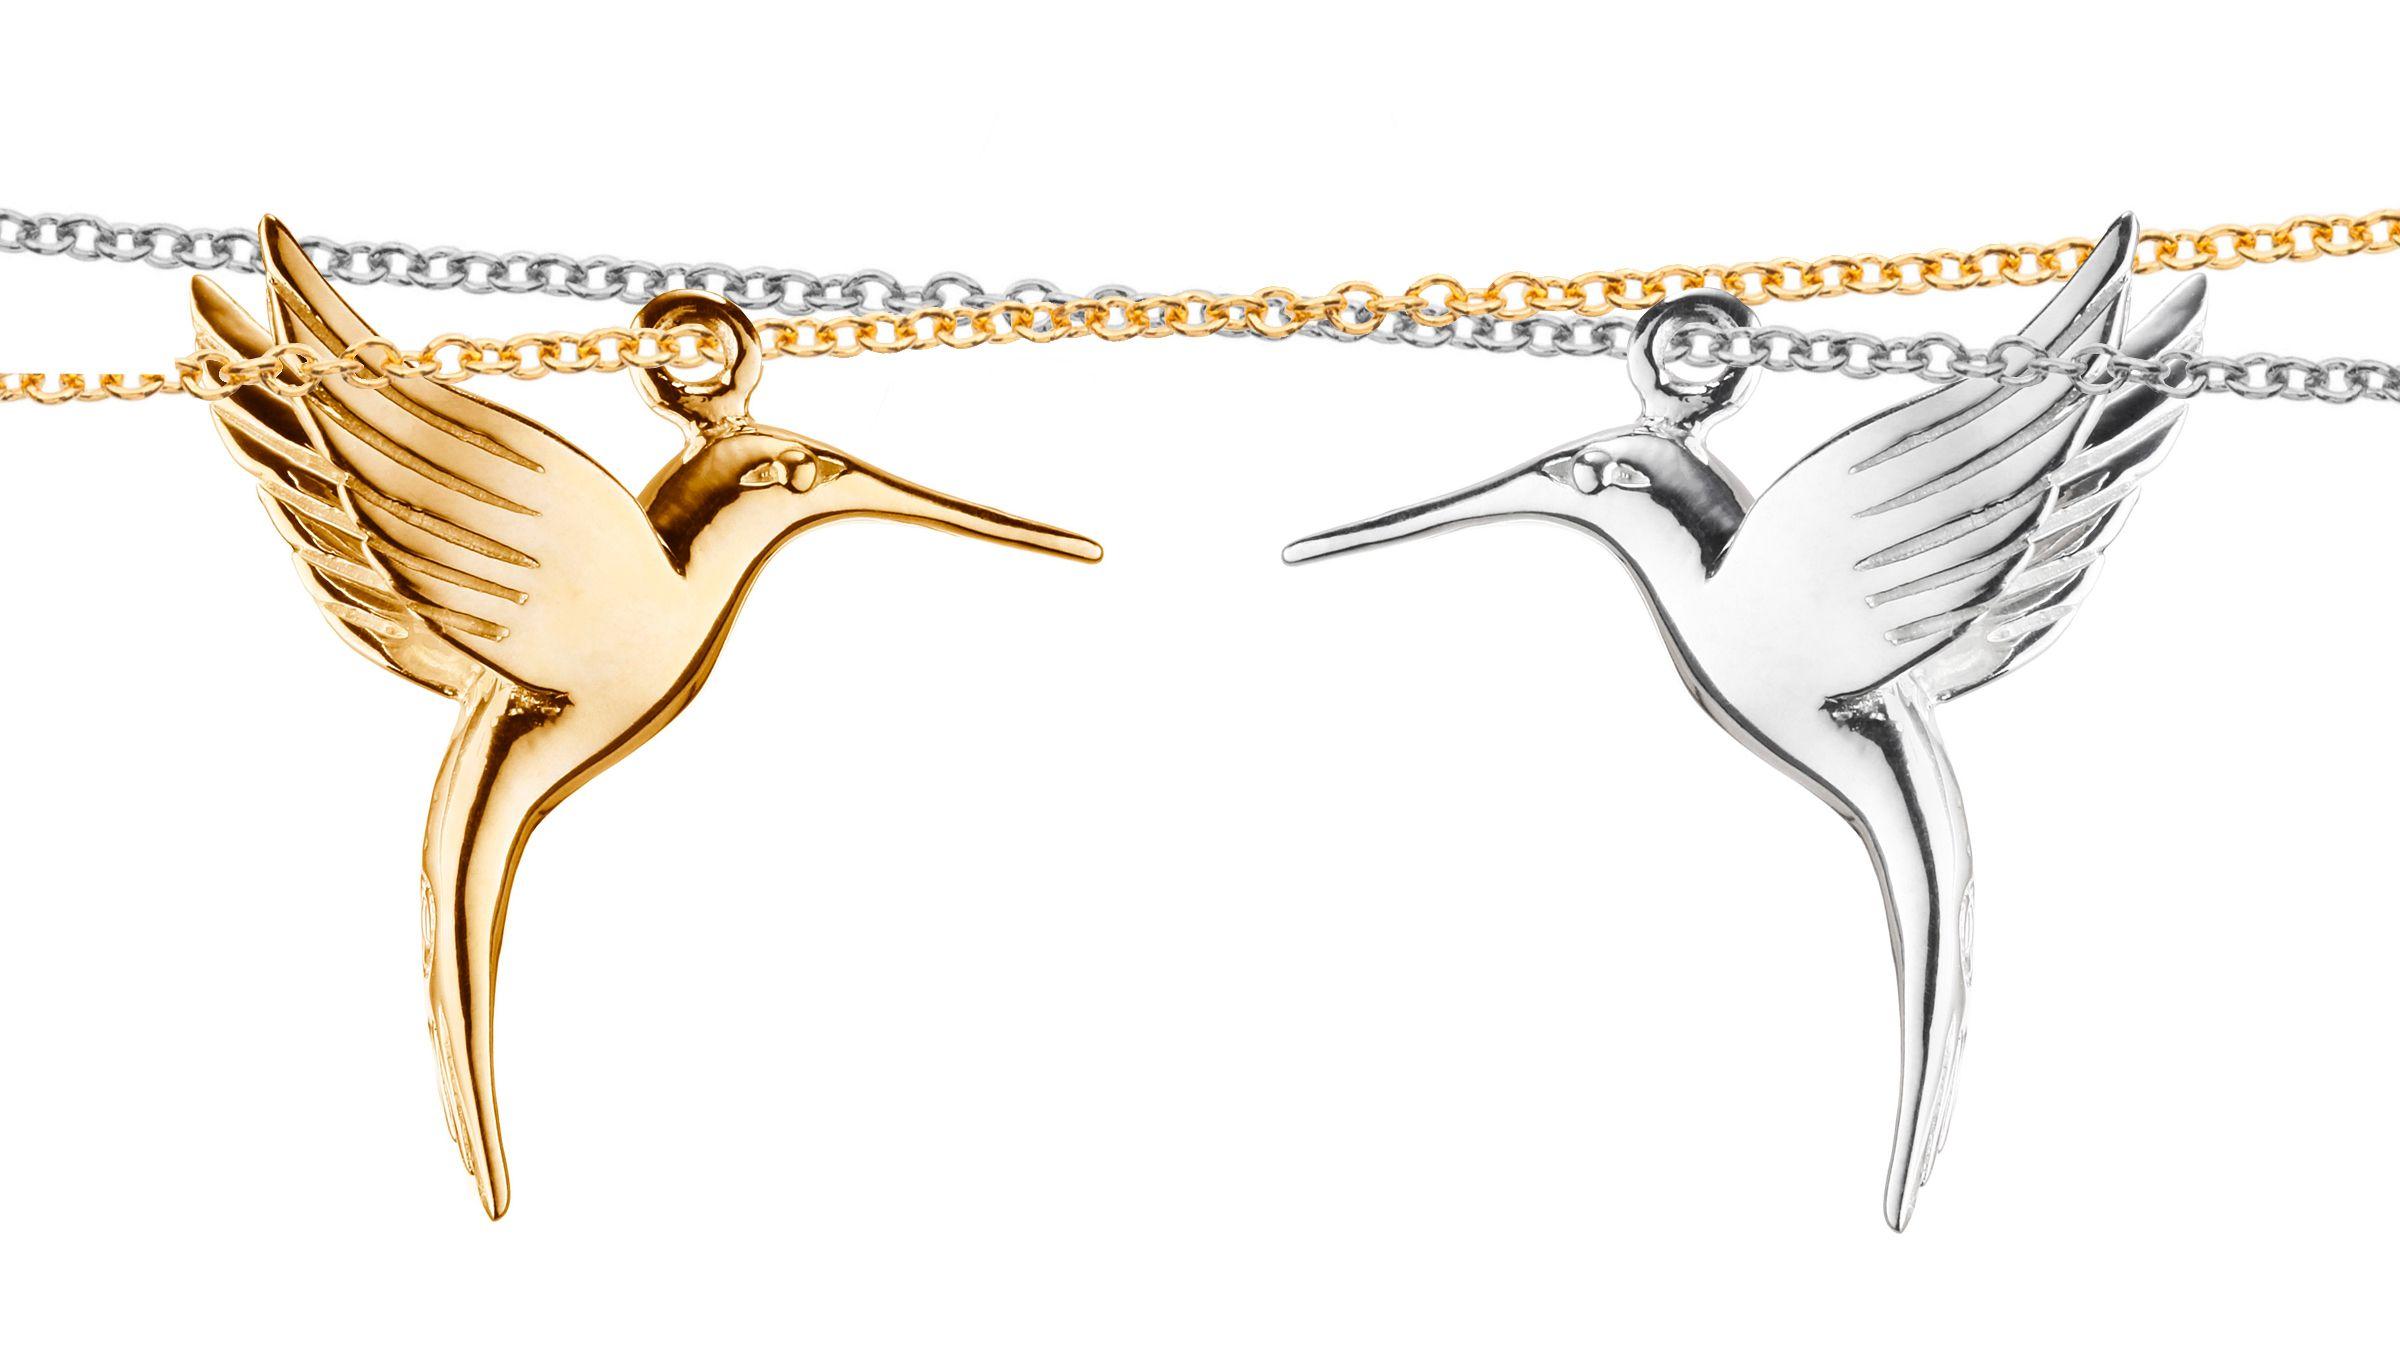 Hummingbird Charm For Charity AHAlife Charmed